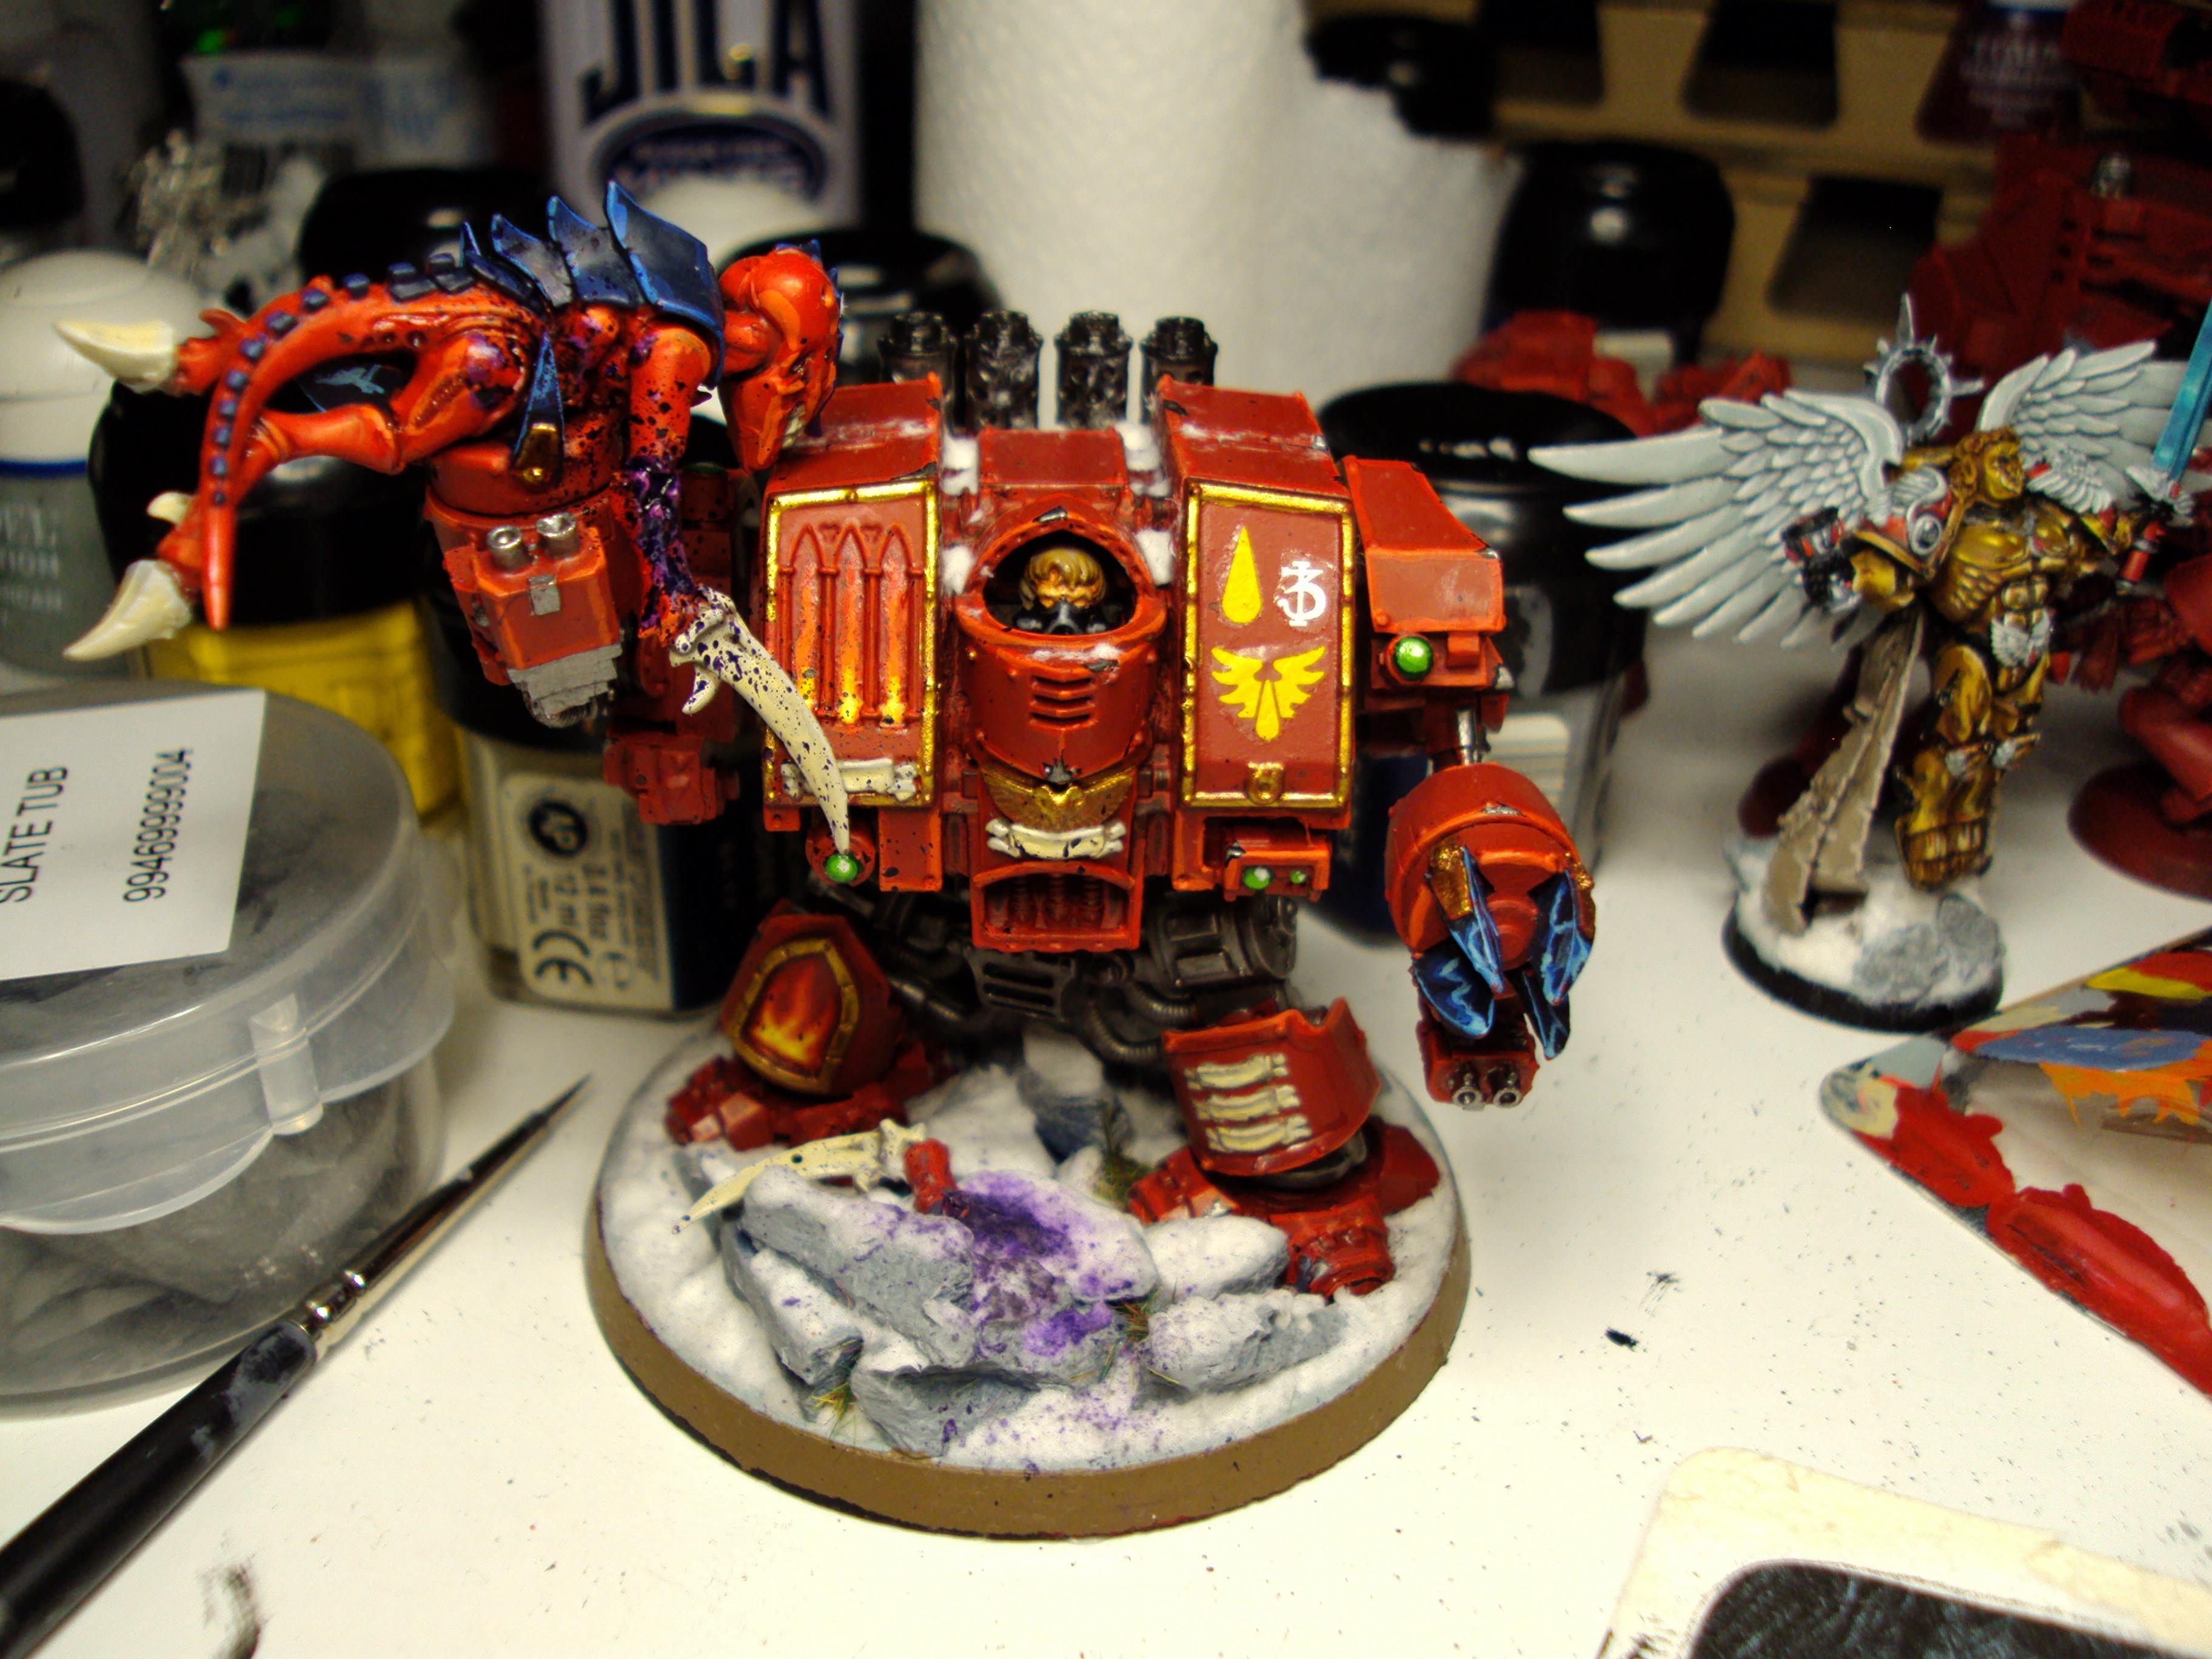 Blood, Blood Angels, Dreadnought, Furioso, Space Marines, Warhammer 40,000